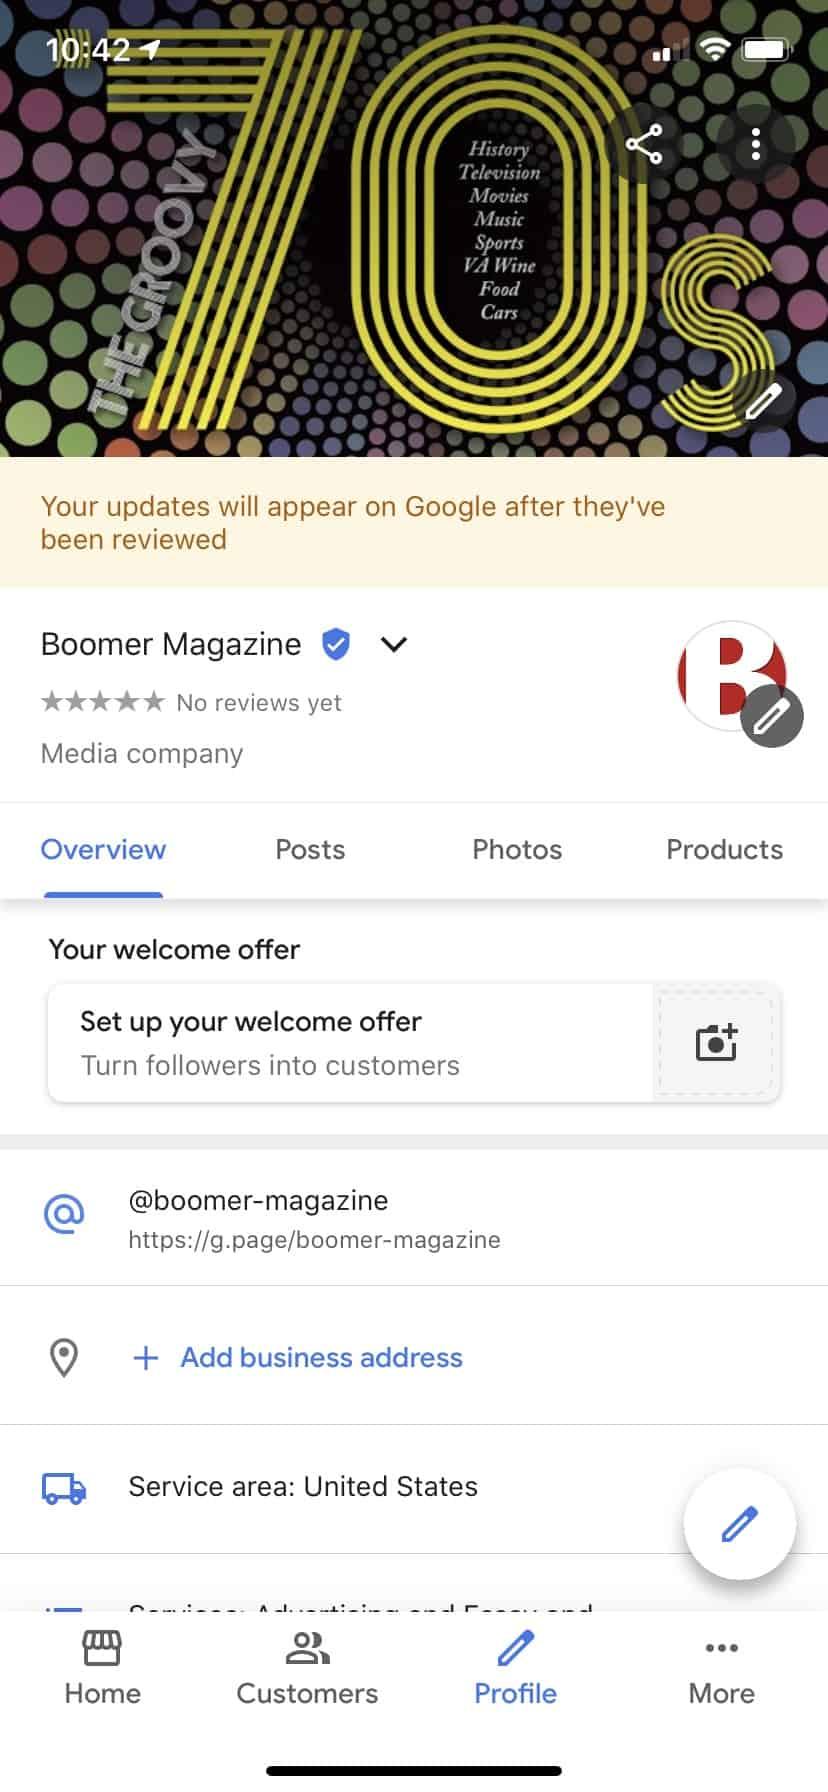 My Business app for Boomer Magazine screenshot